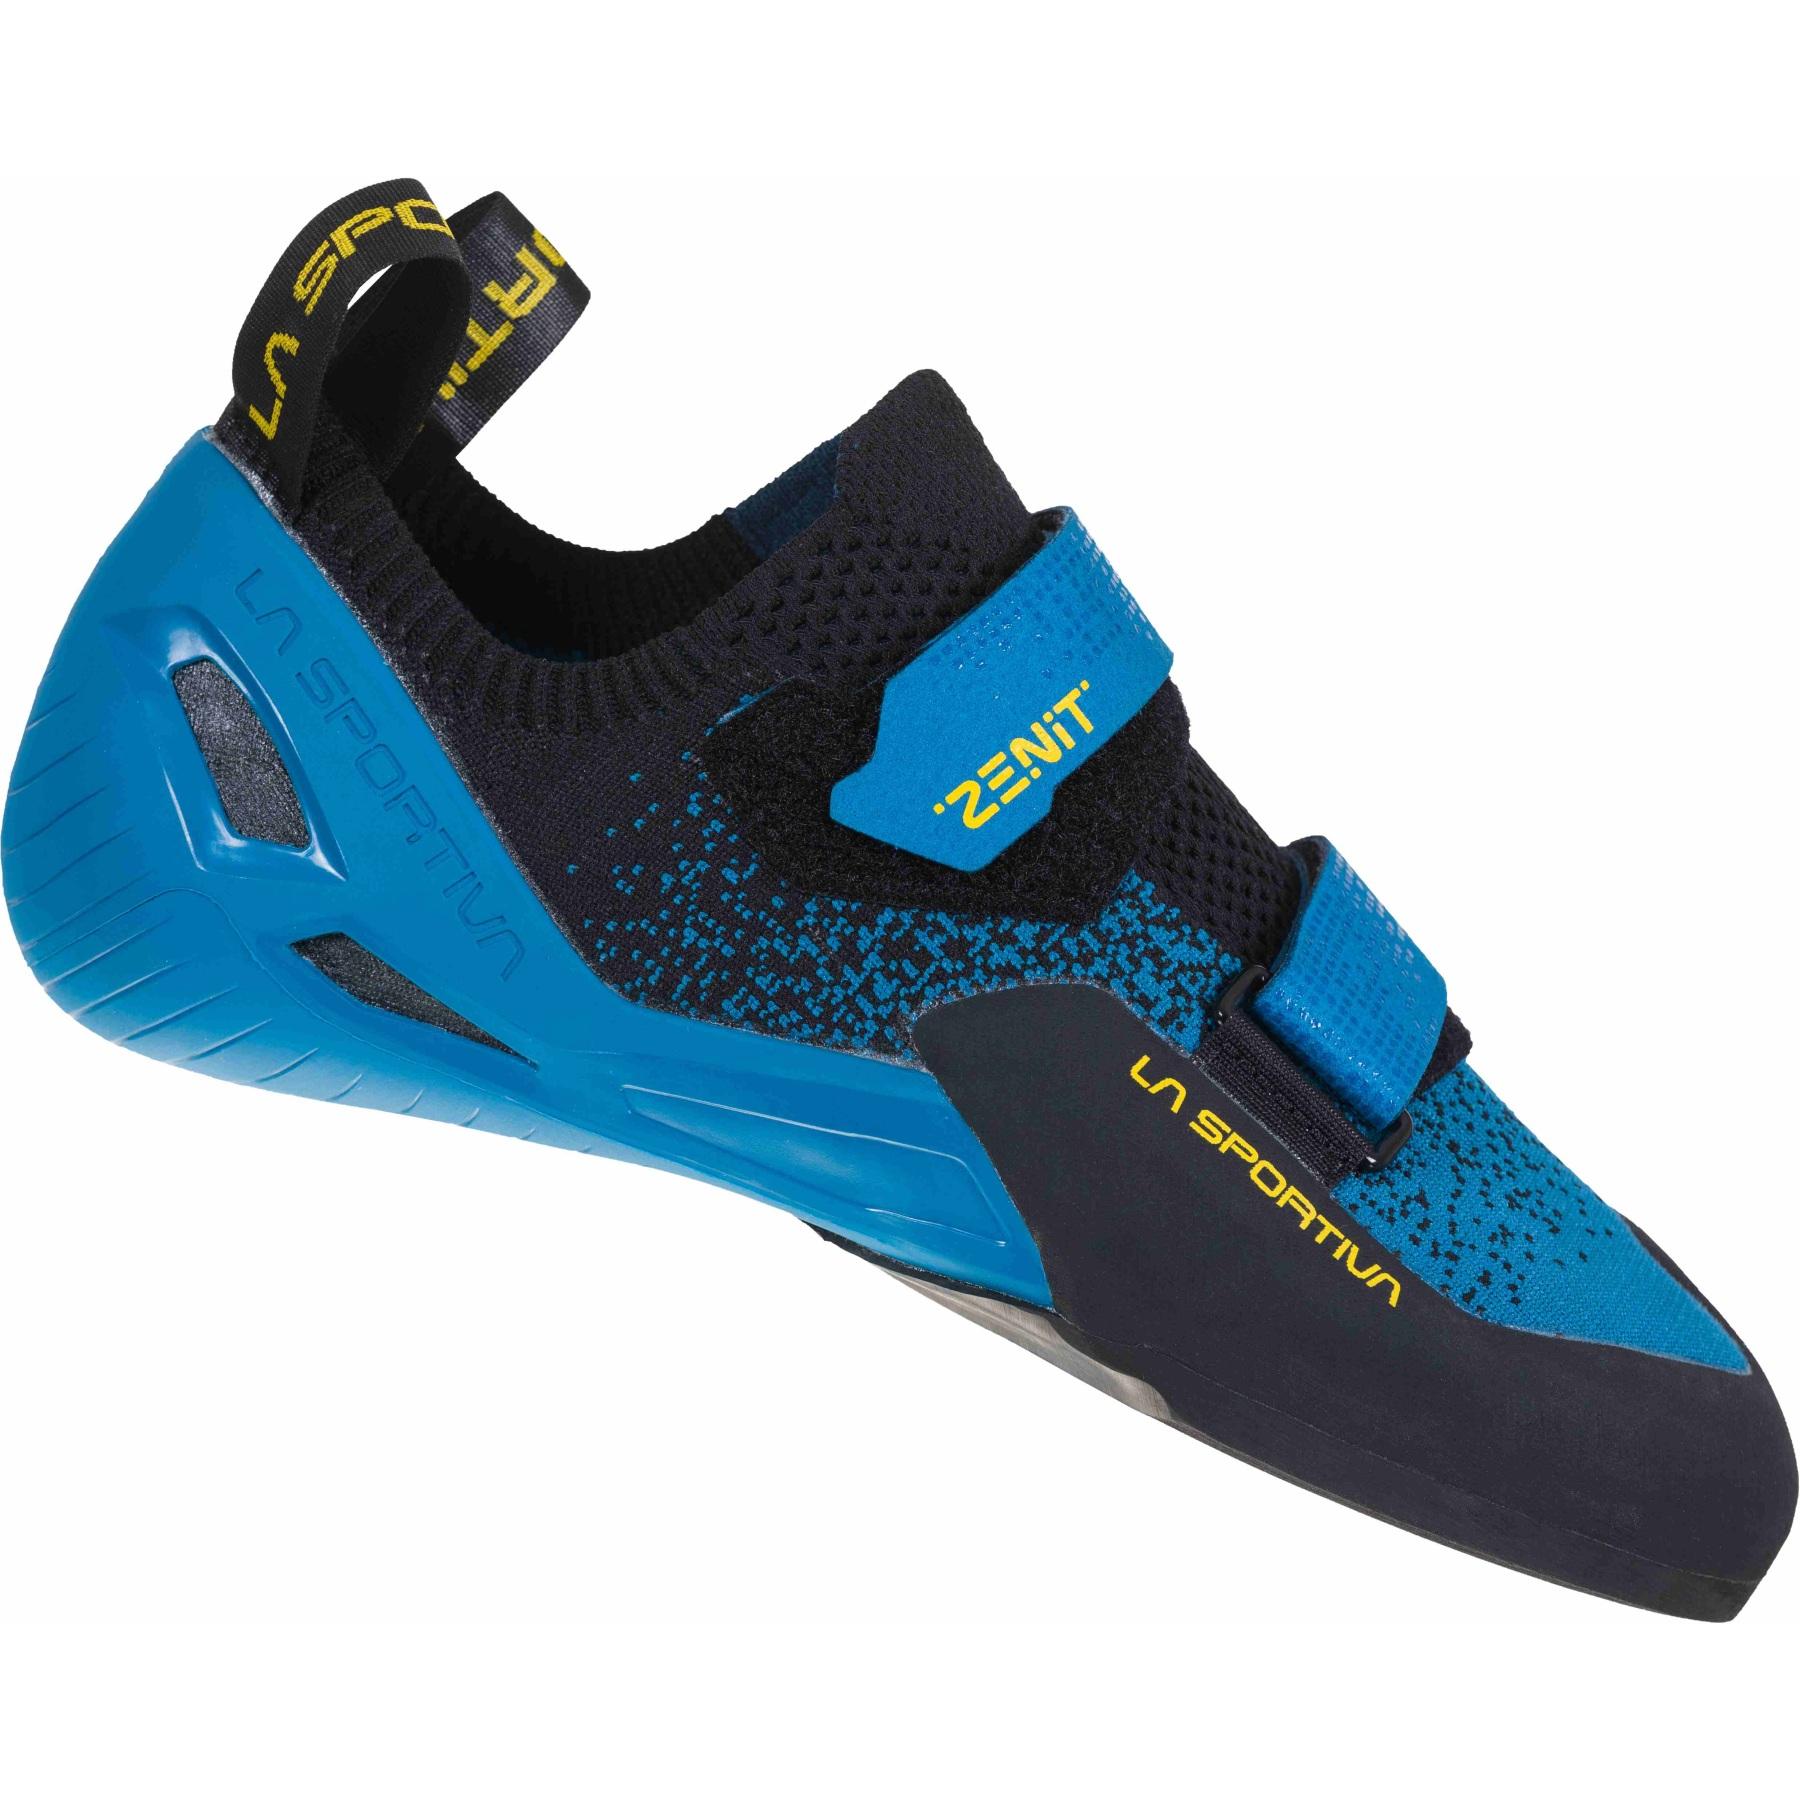 La Sportiva Zenit Climbing Shoes - Neptune/Black